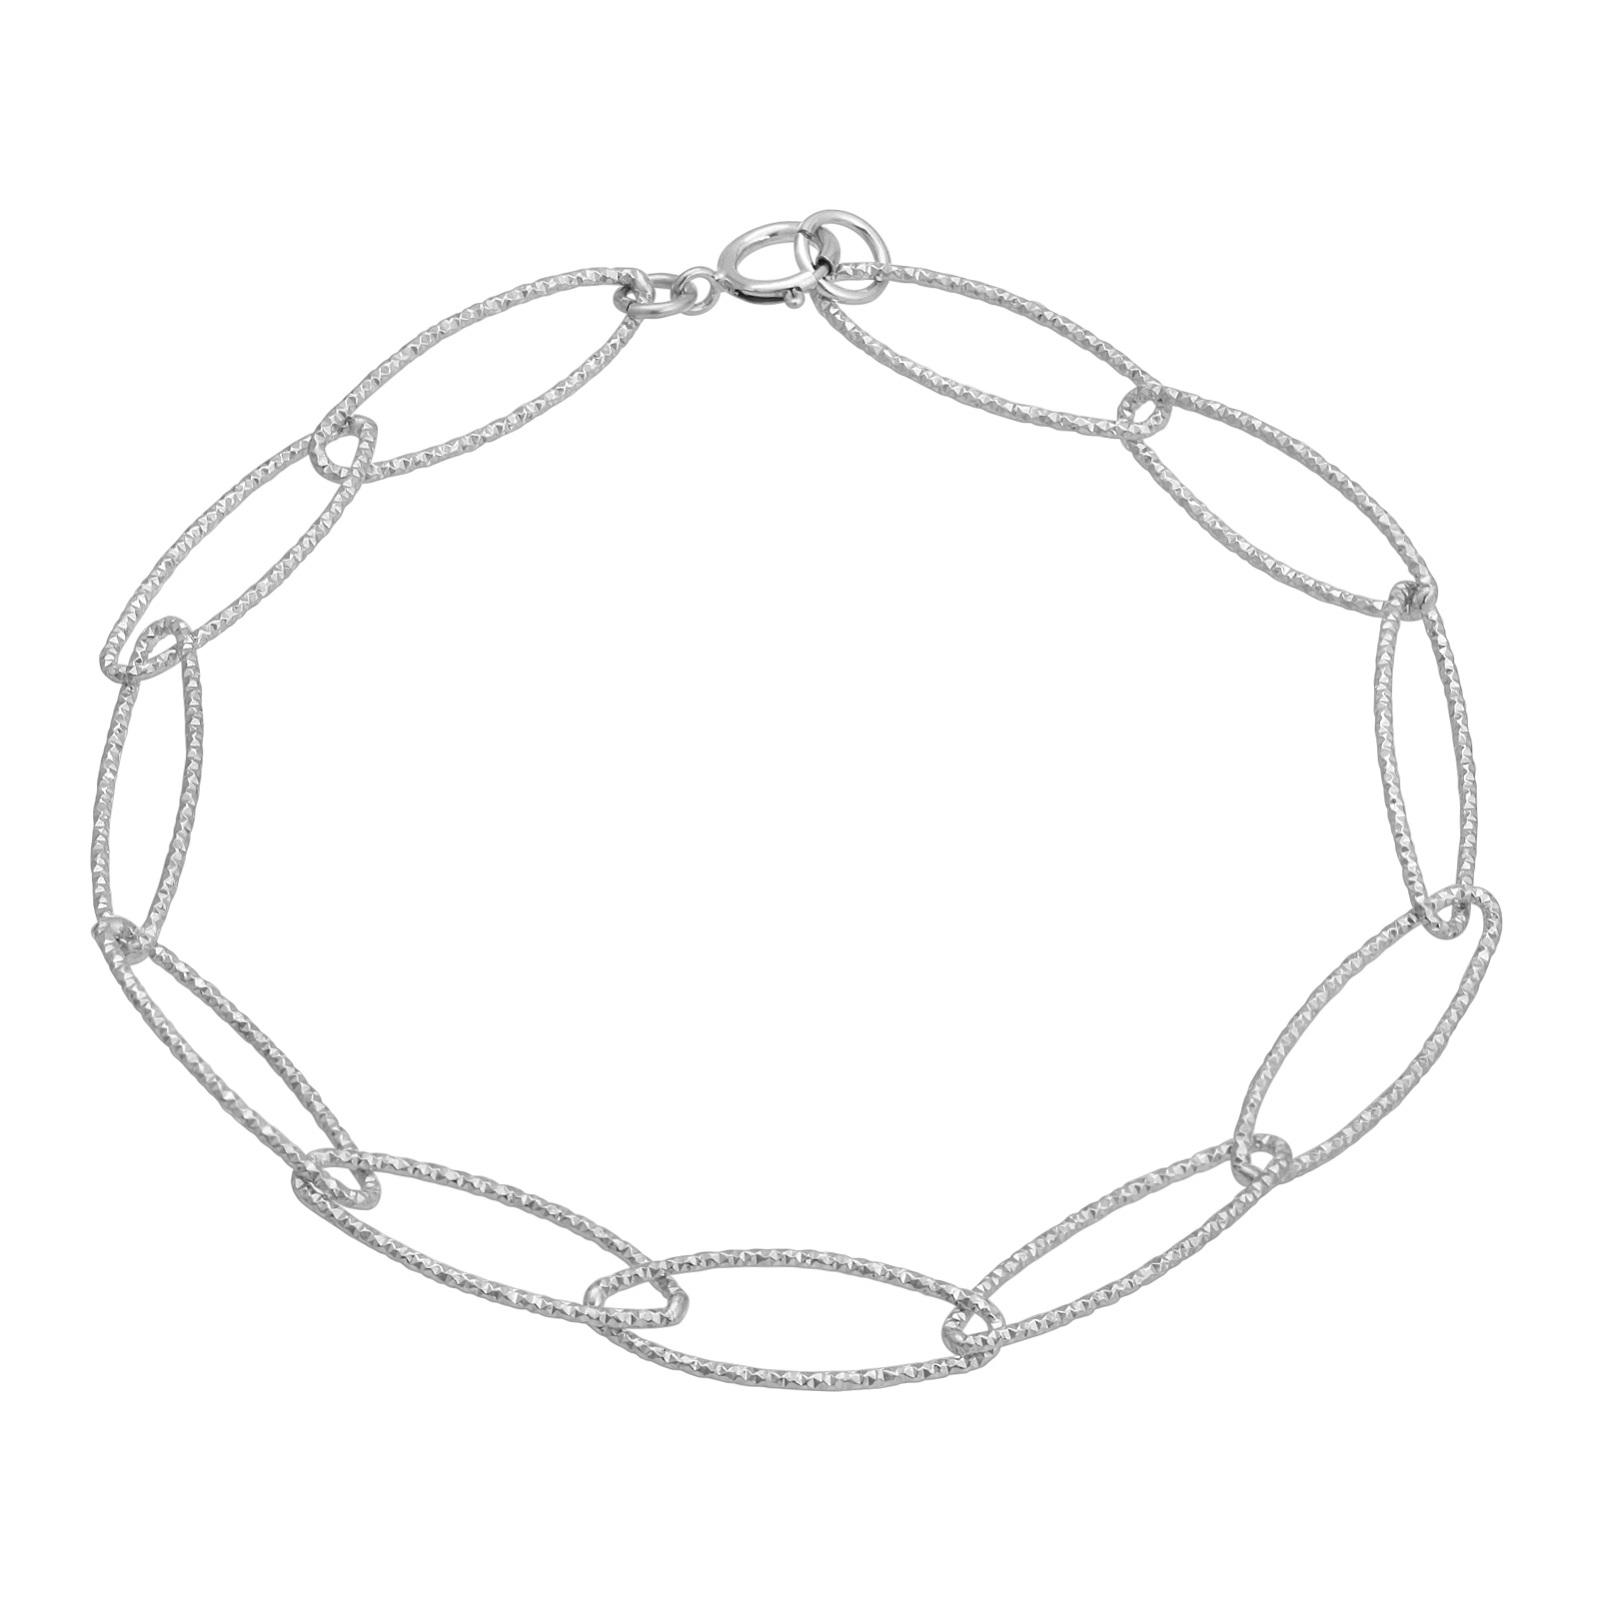 Silver Oval Diamond Cut Bracelet